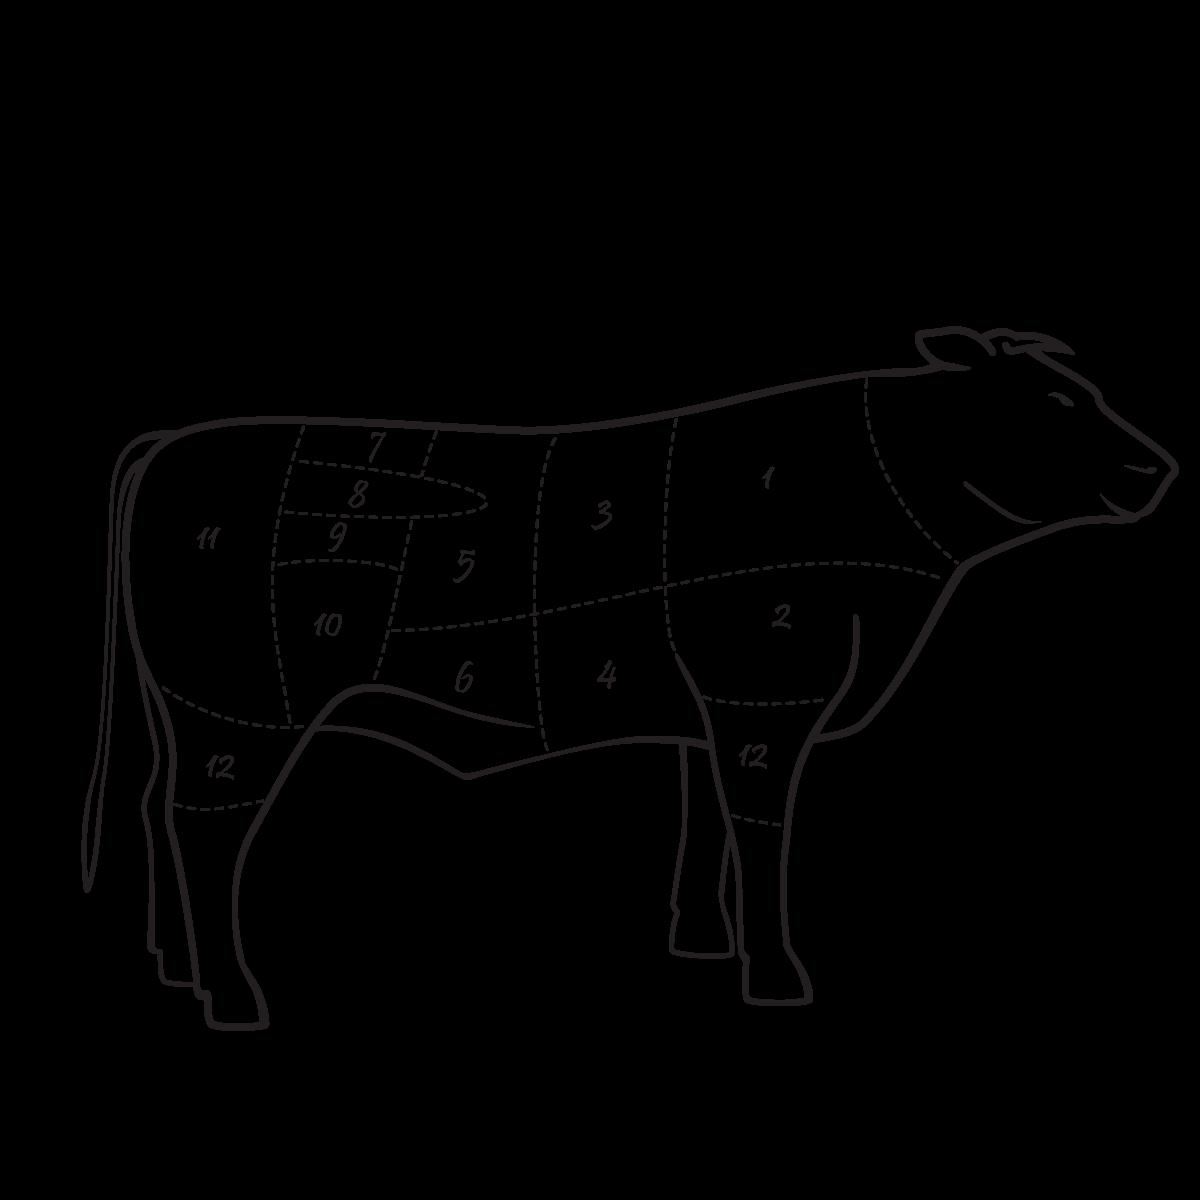 decoupe-viande-de-boeuf-grossiste-boucher